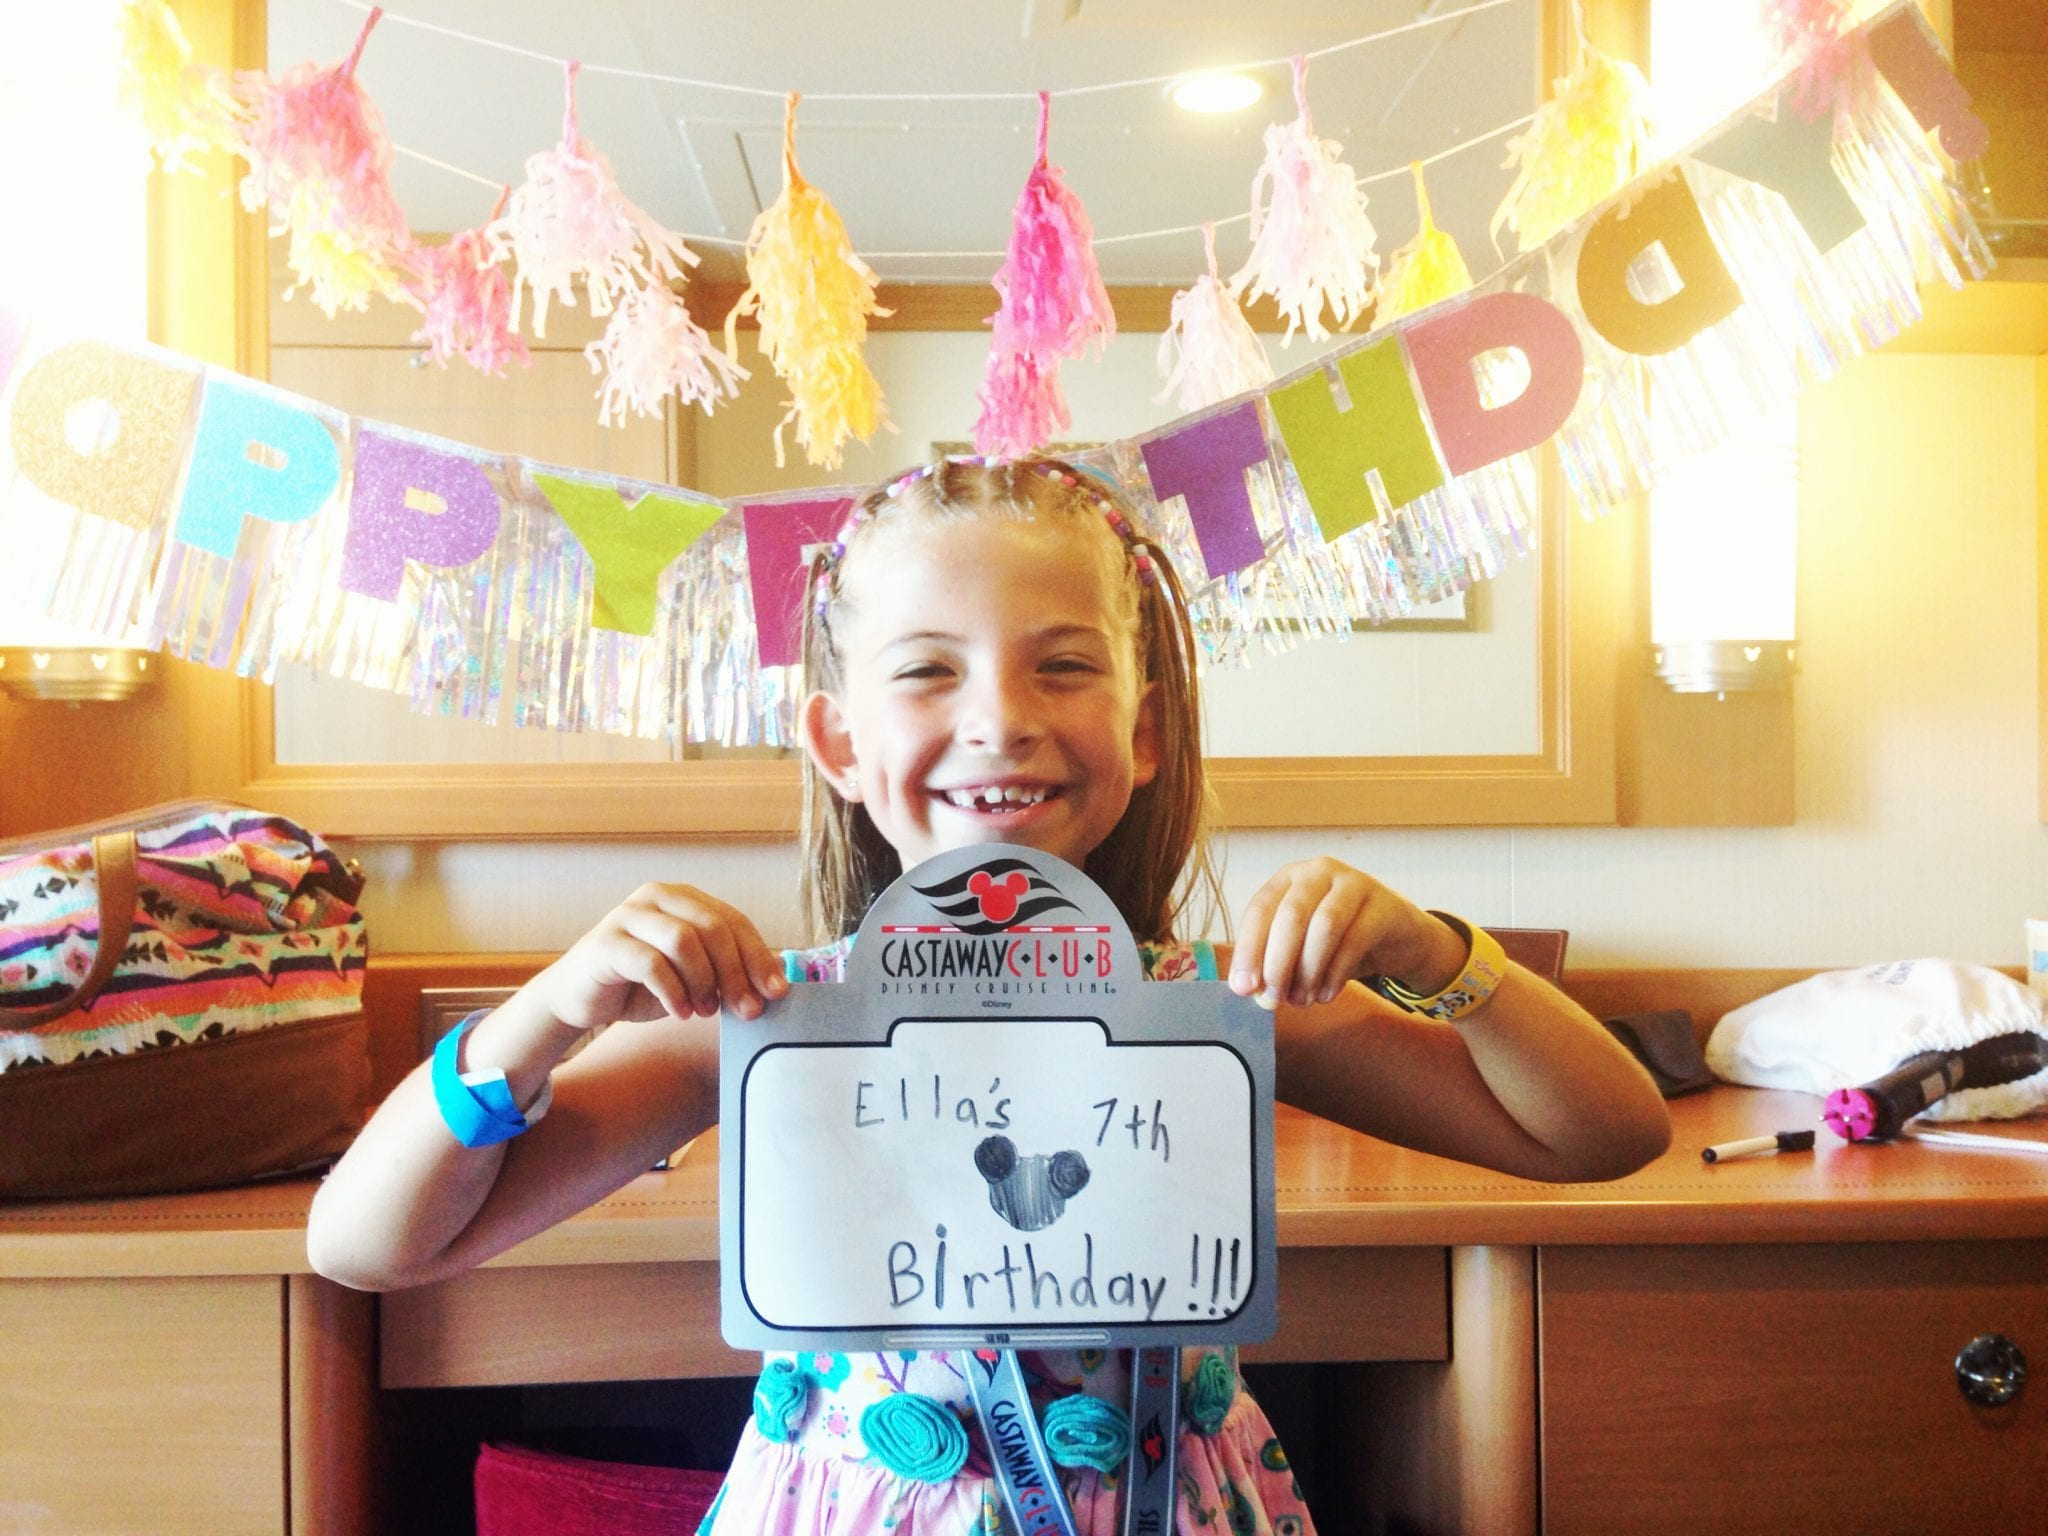 Disneyland Birthdays 10 Tips To Make The Day EXTRA Special